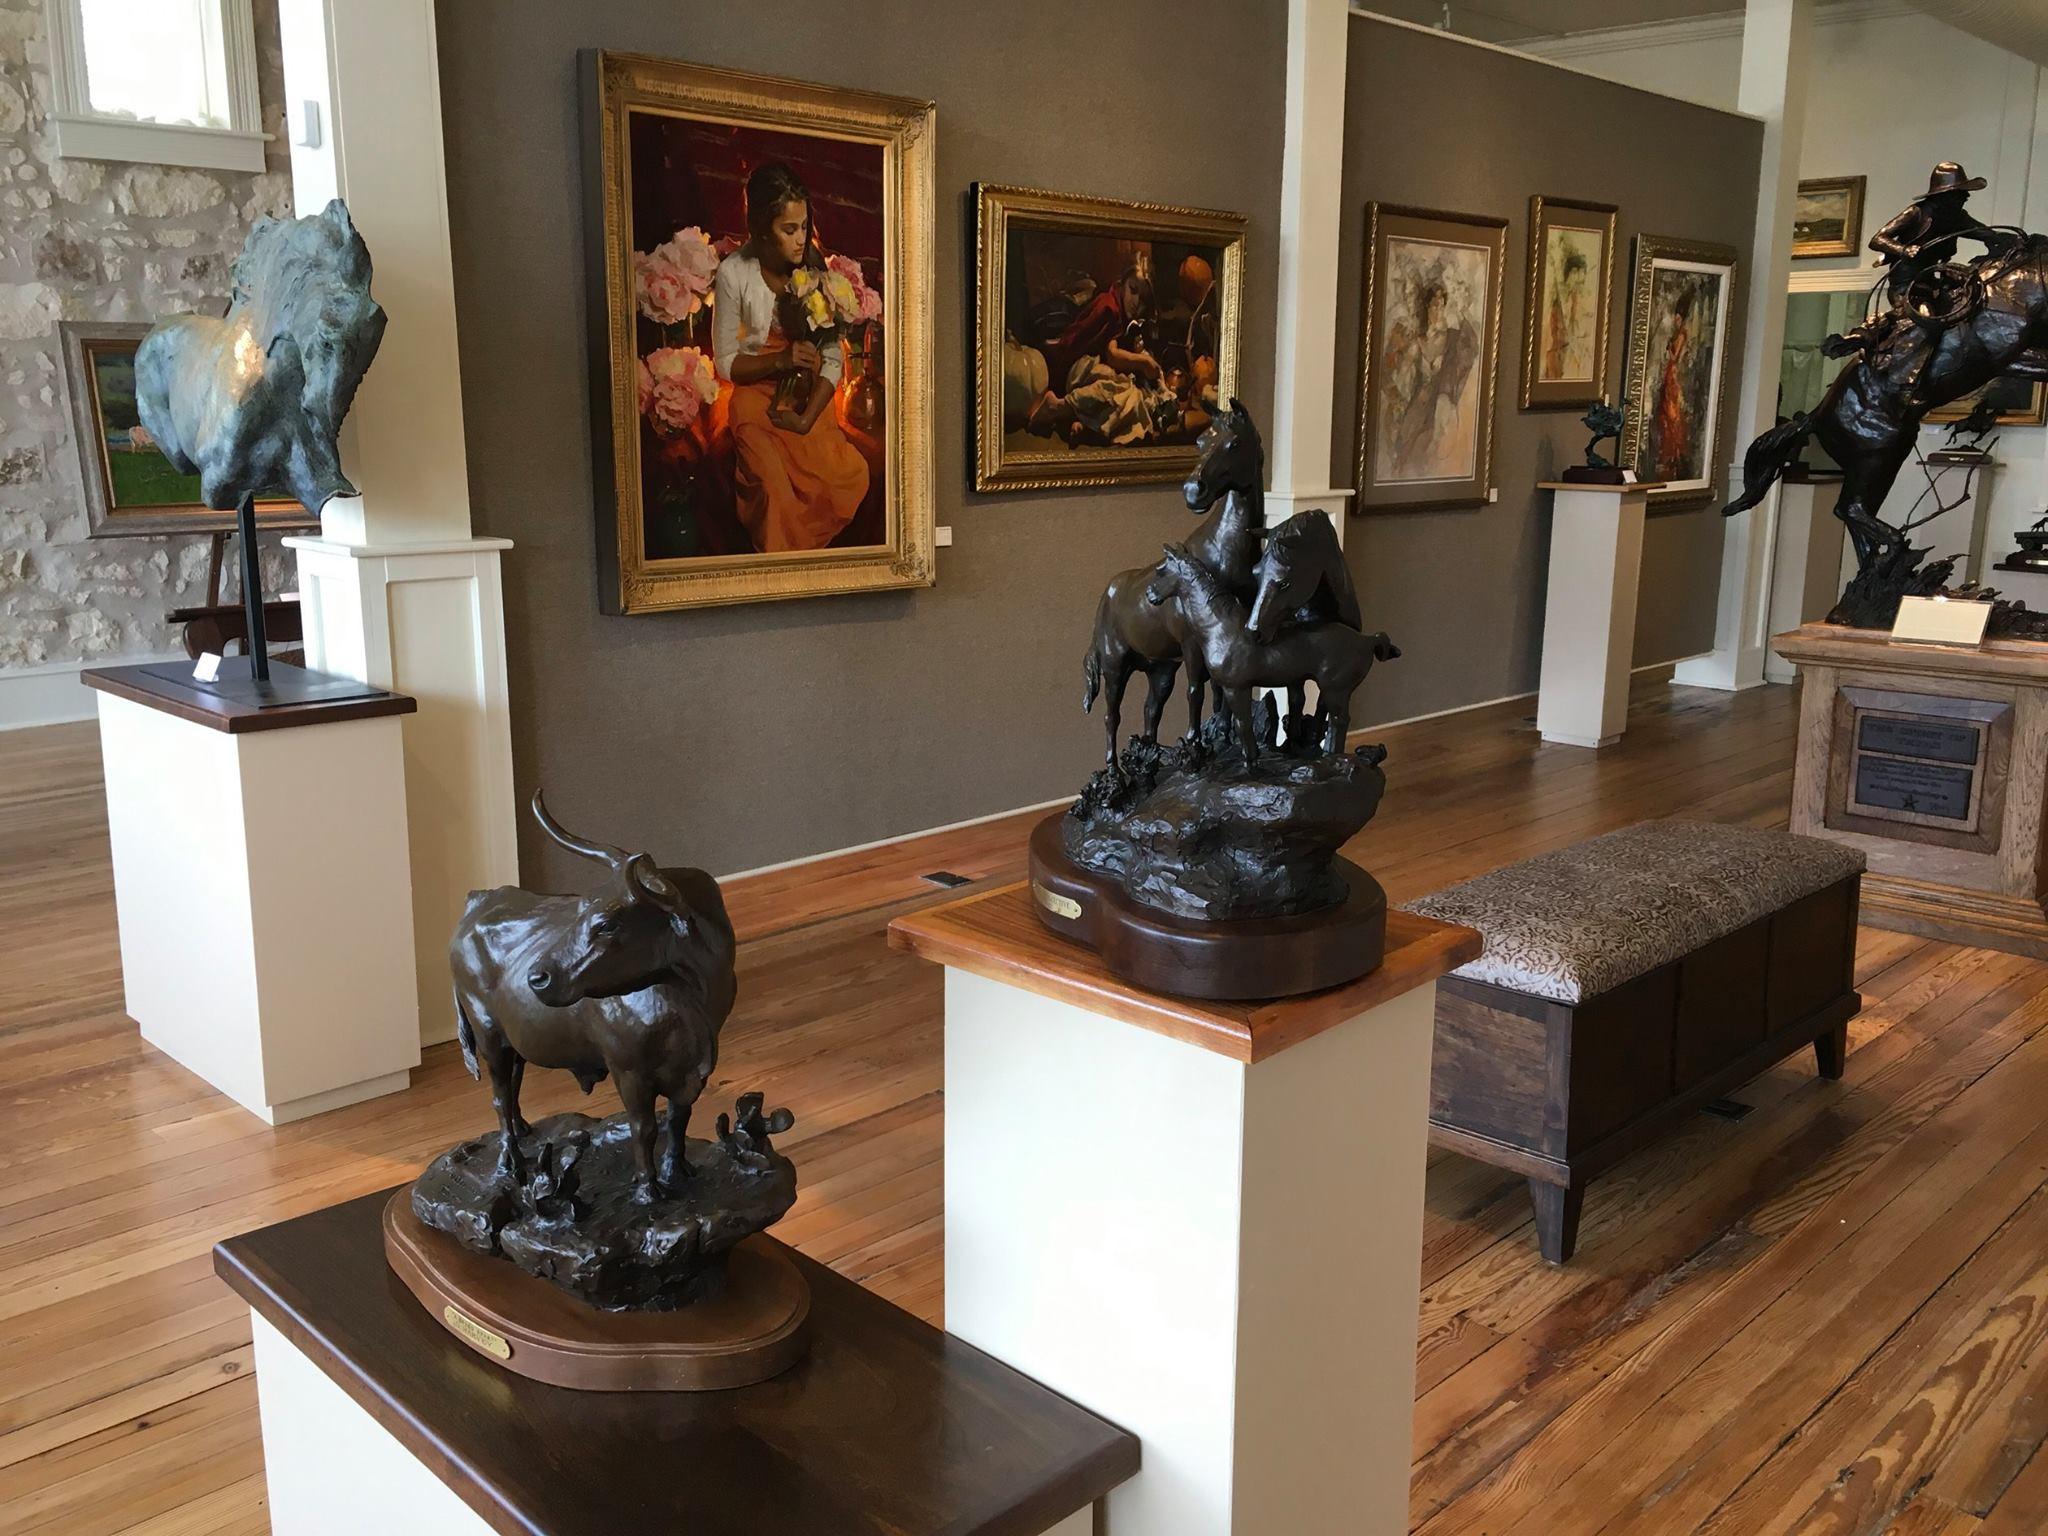 Gallery 330